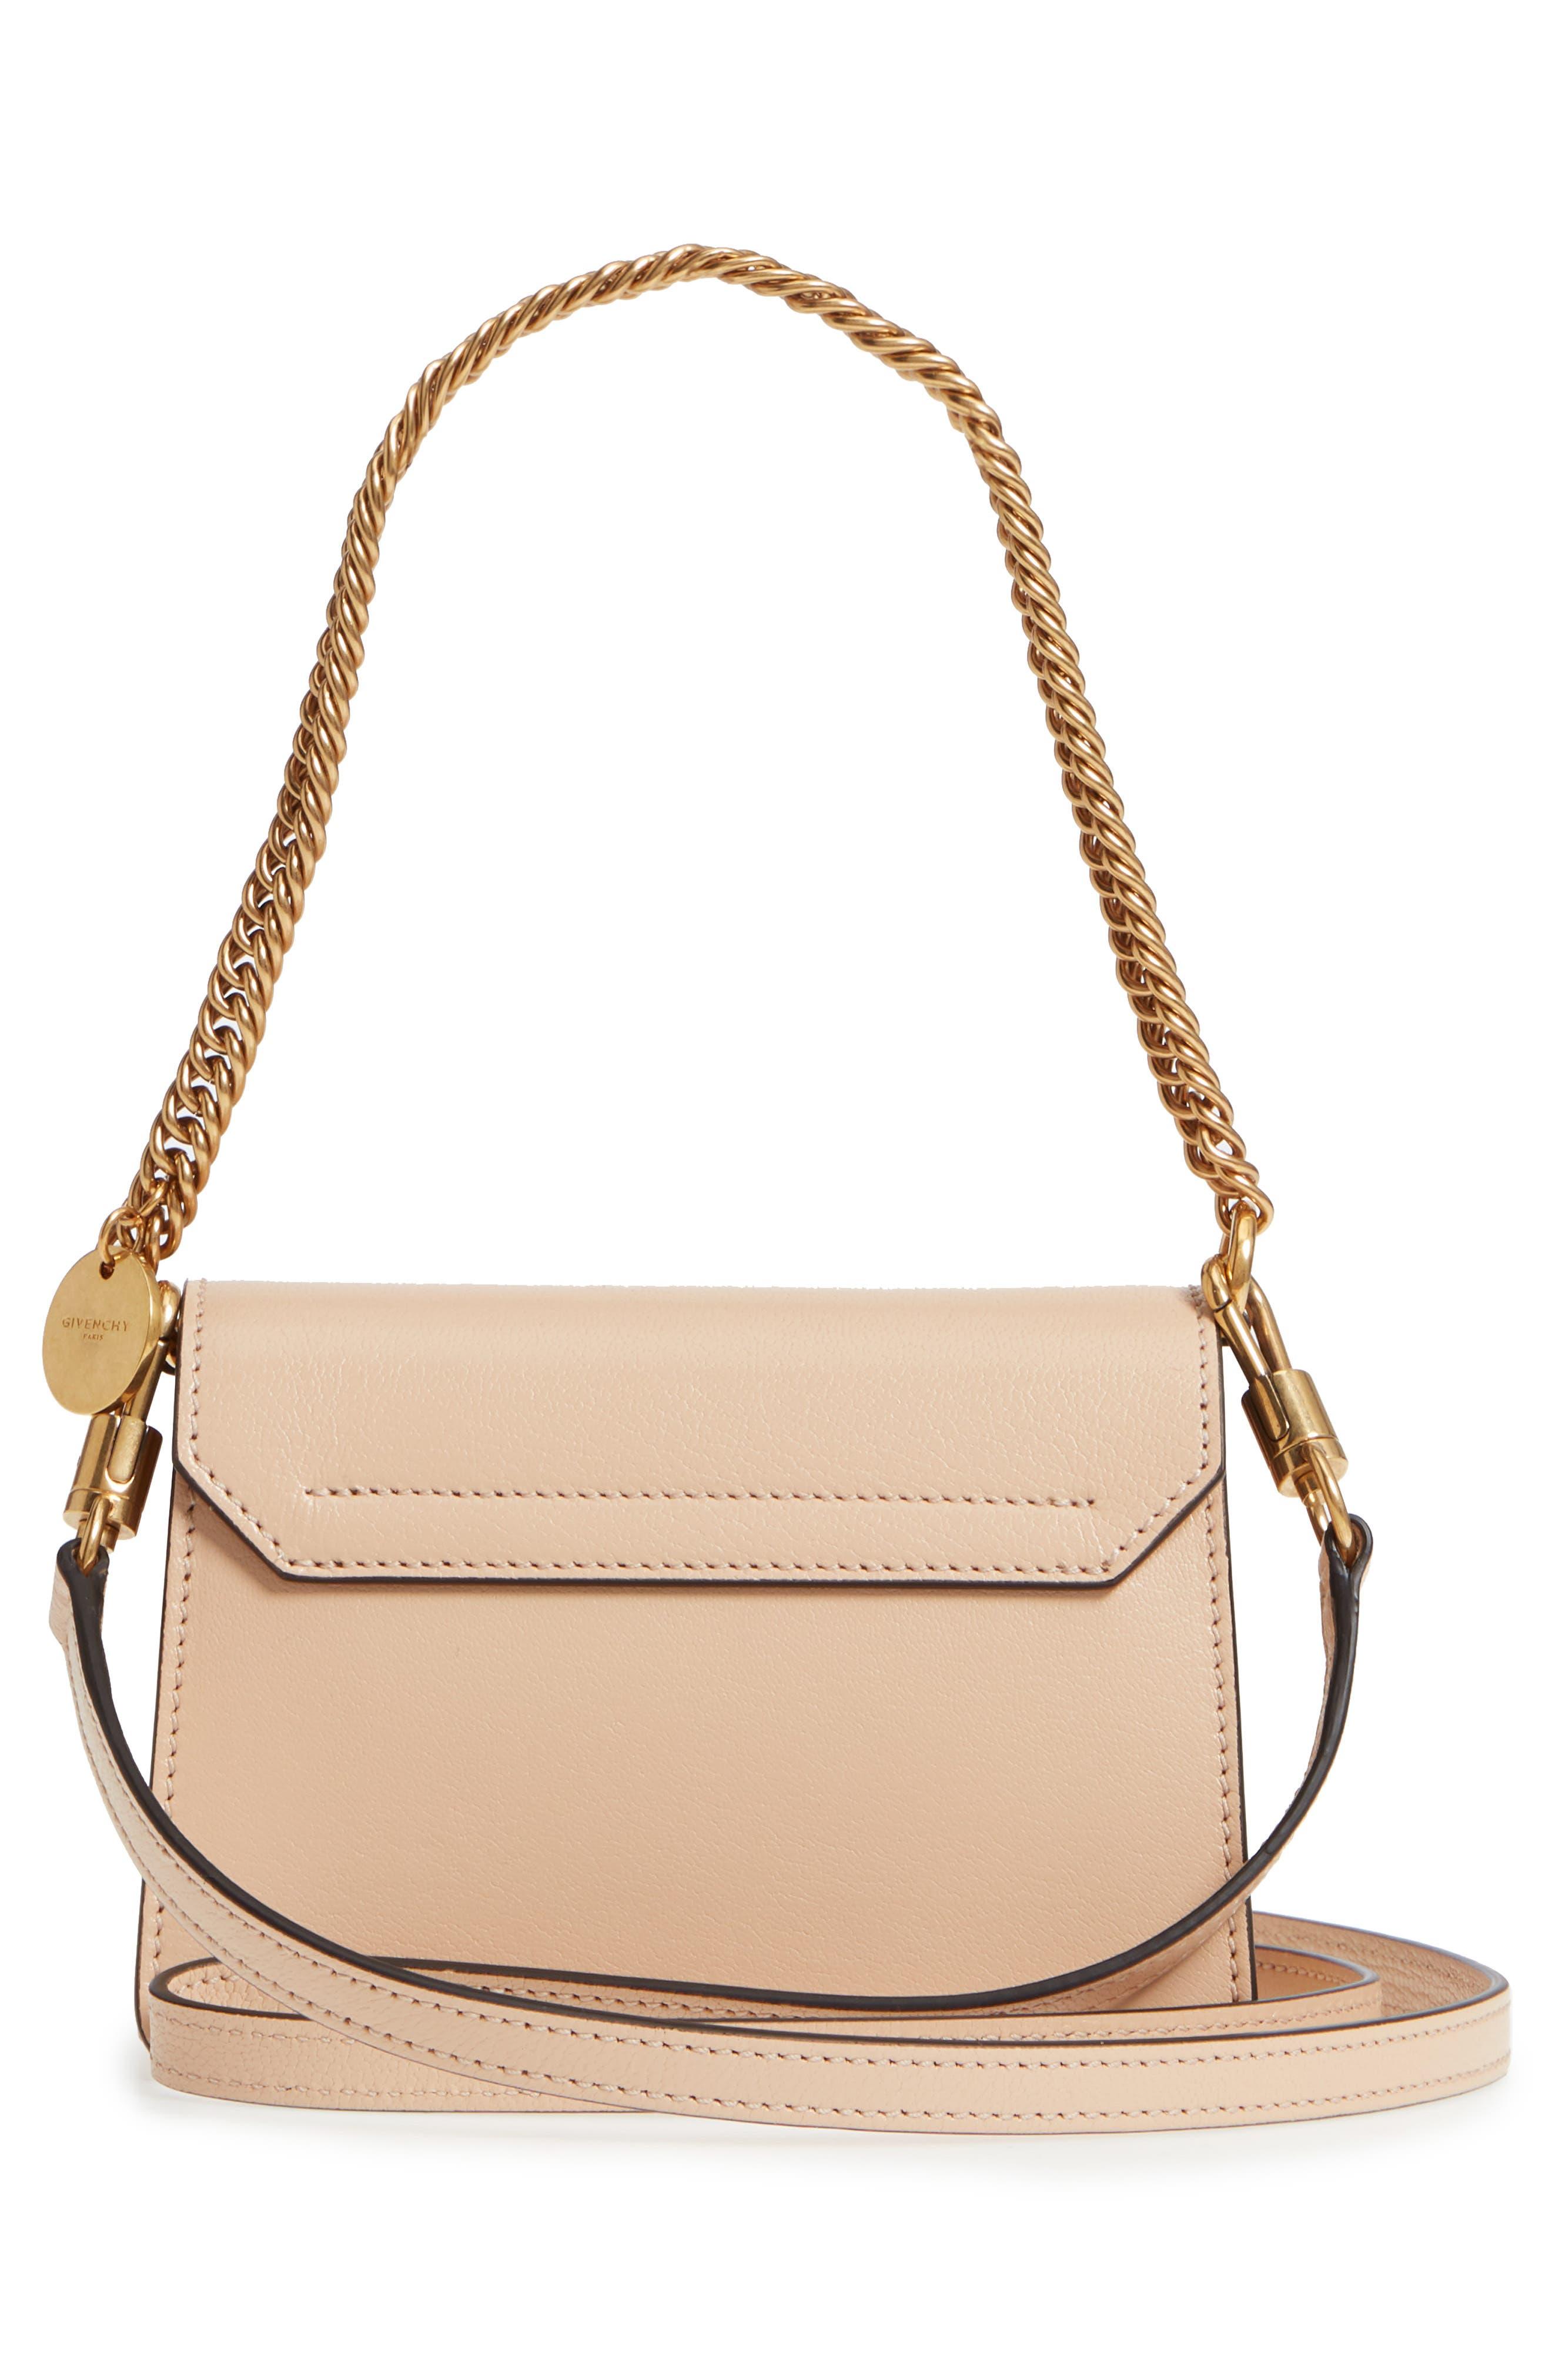 Mini GV3 Leather & Suede Crossbody Bag,                             Alternate thumbnail 3, color,                             Nude/ Light Beige